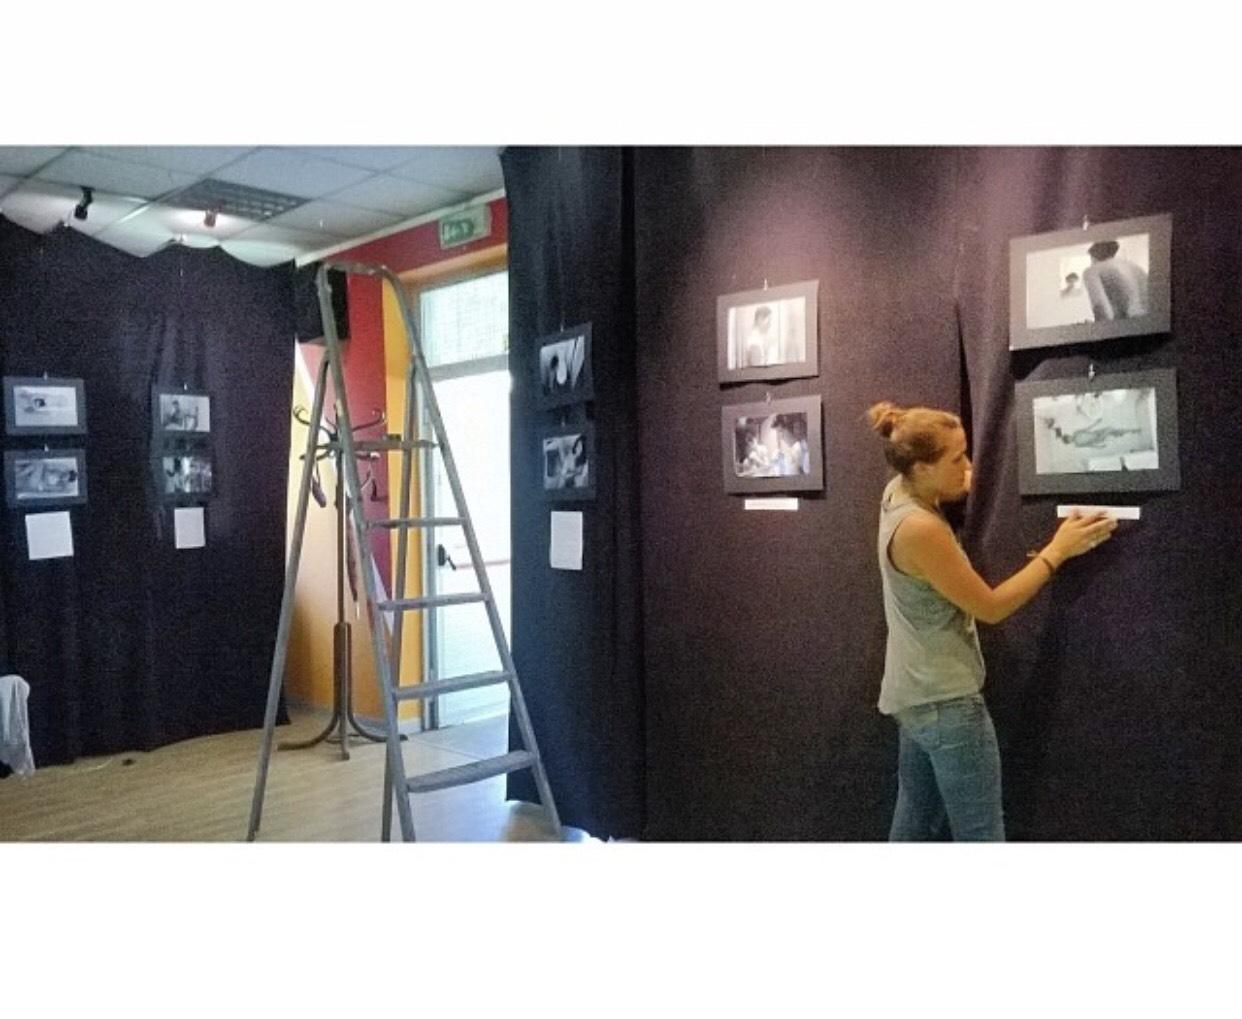 FULL DISCLOTHESURE's debut exhibition in Milan, Italy. Exhibited in Spazzio Baluardo.